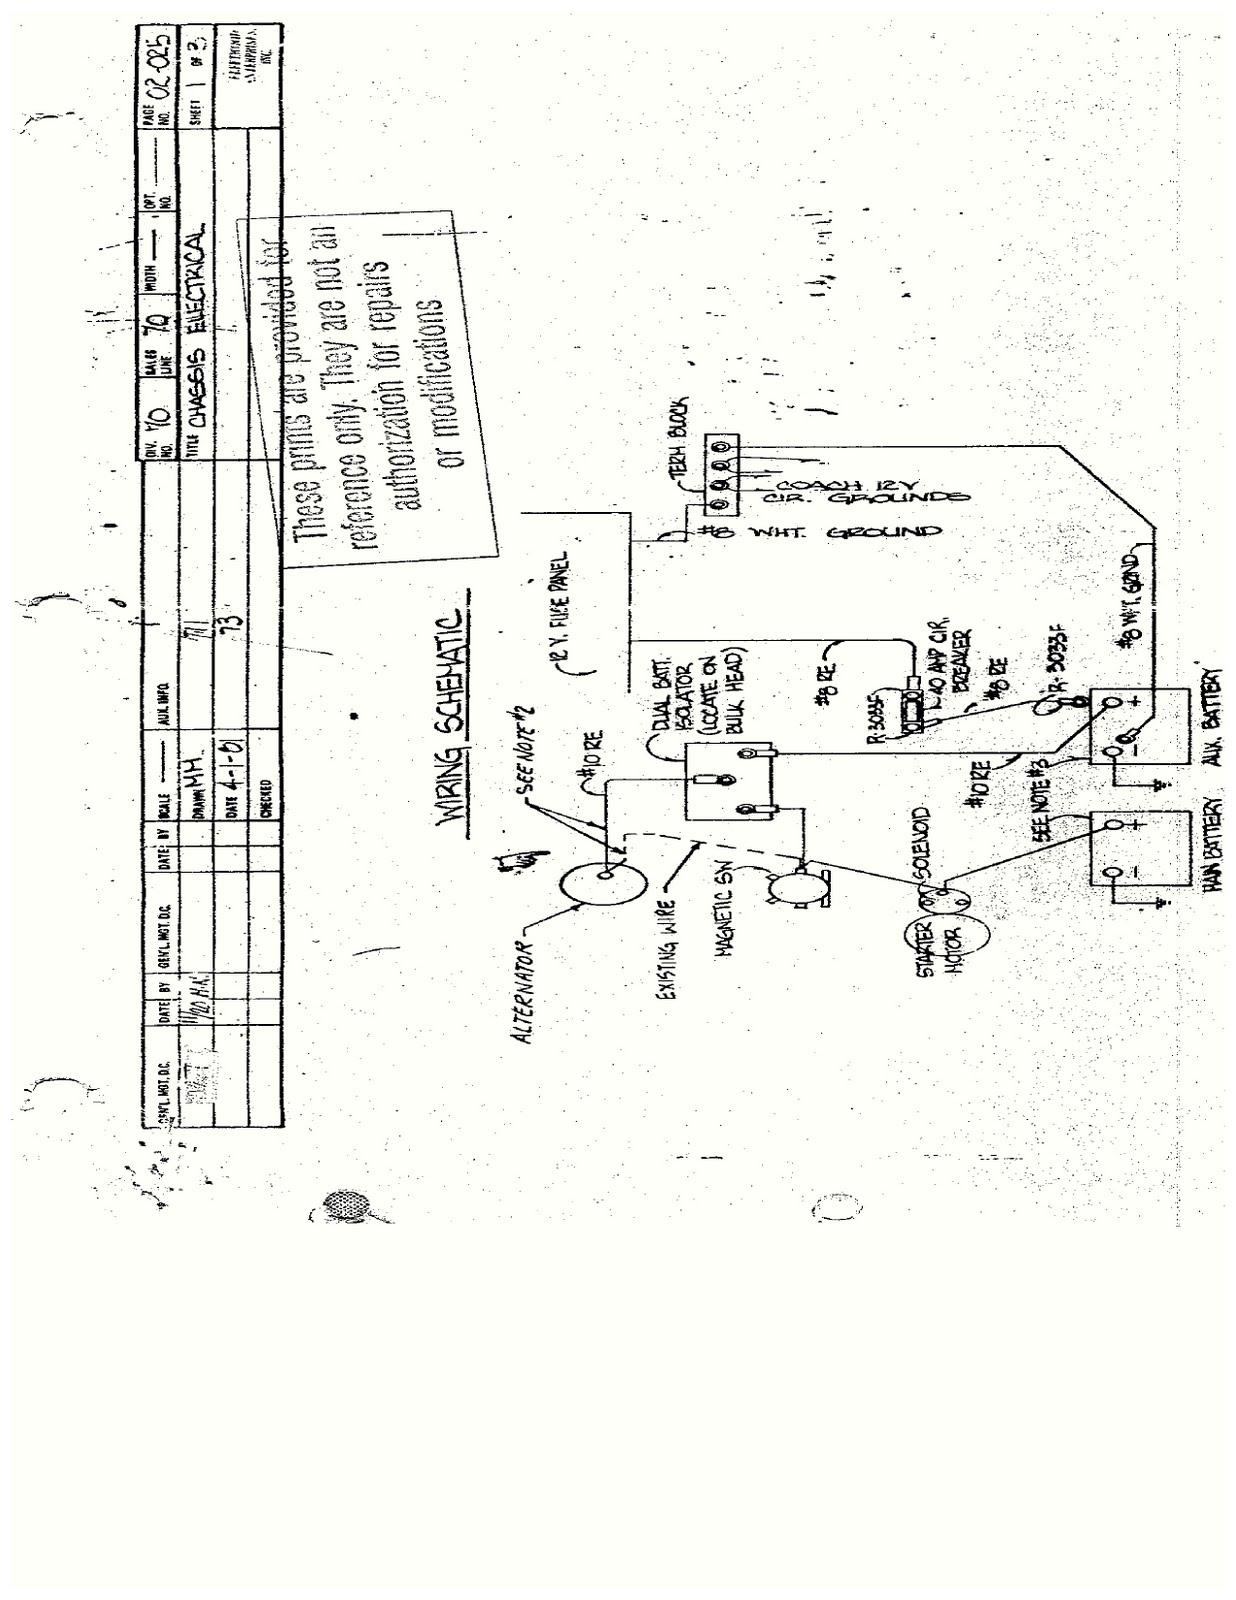 Fiero Wiring Diagram Fuse Block